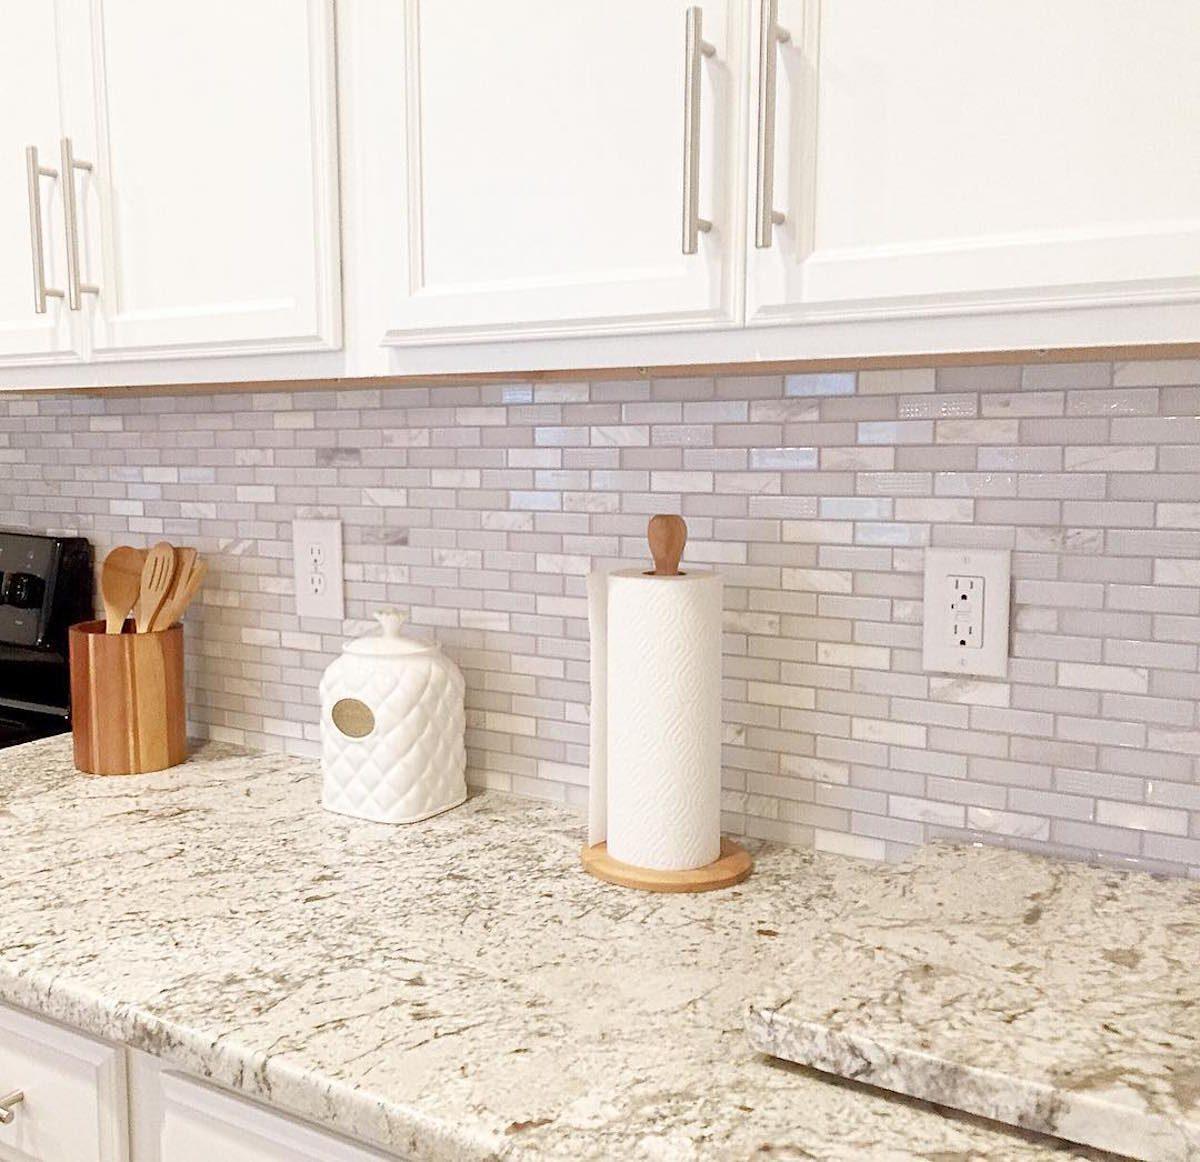 My Diy Peel And Stick Tile Backsplash Installation: 8 DIY Peel-and-Stick Kitchen Backsplash Ideas